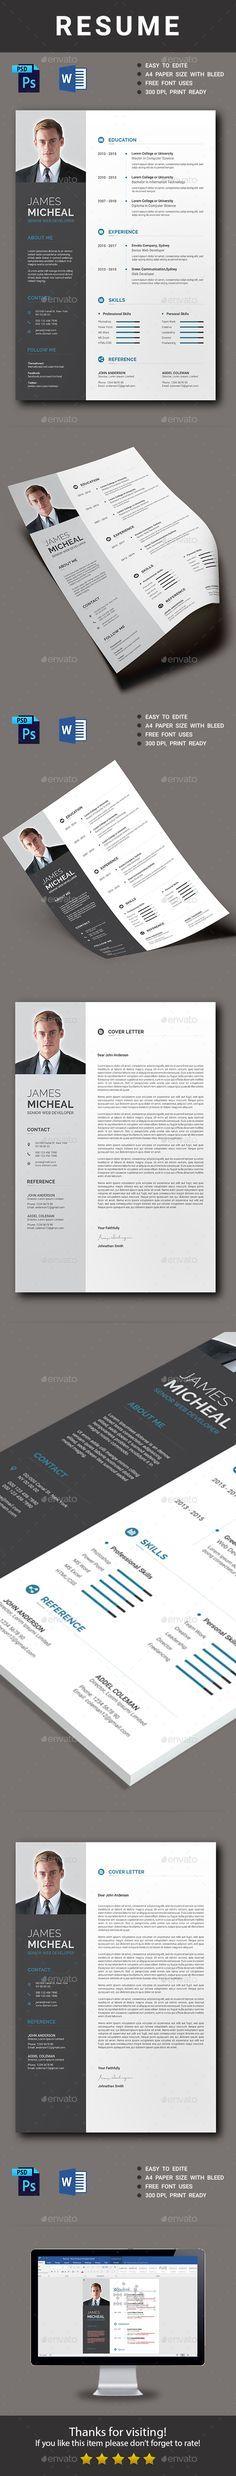 96 best Resume images on Pinterest Resume templates, Cv template - new libre office resume template